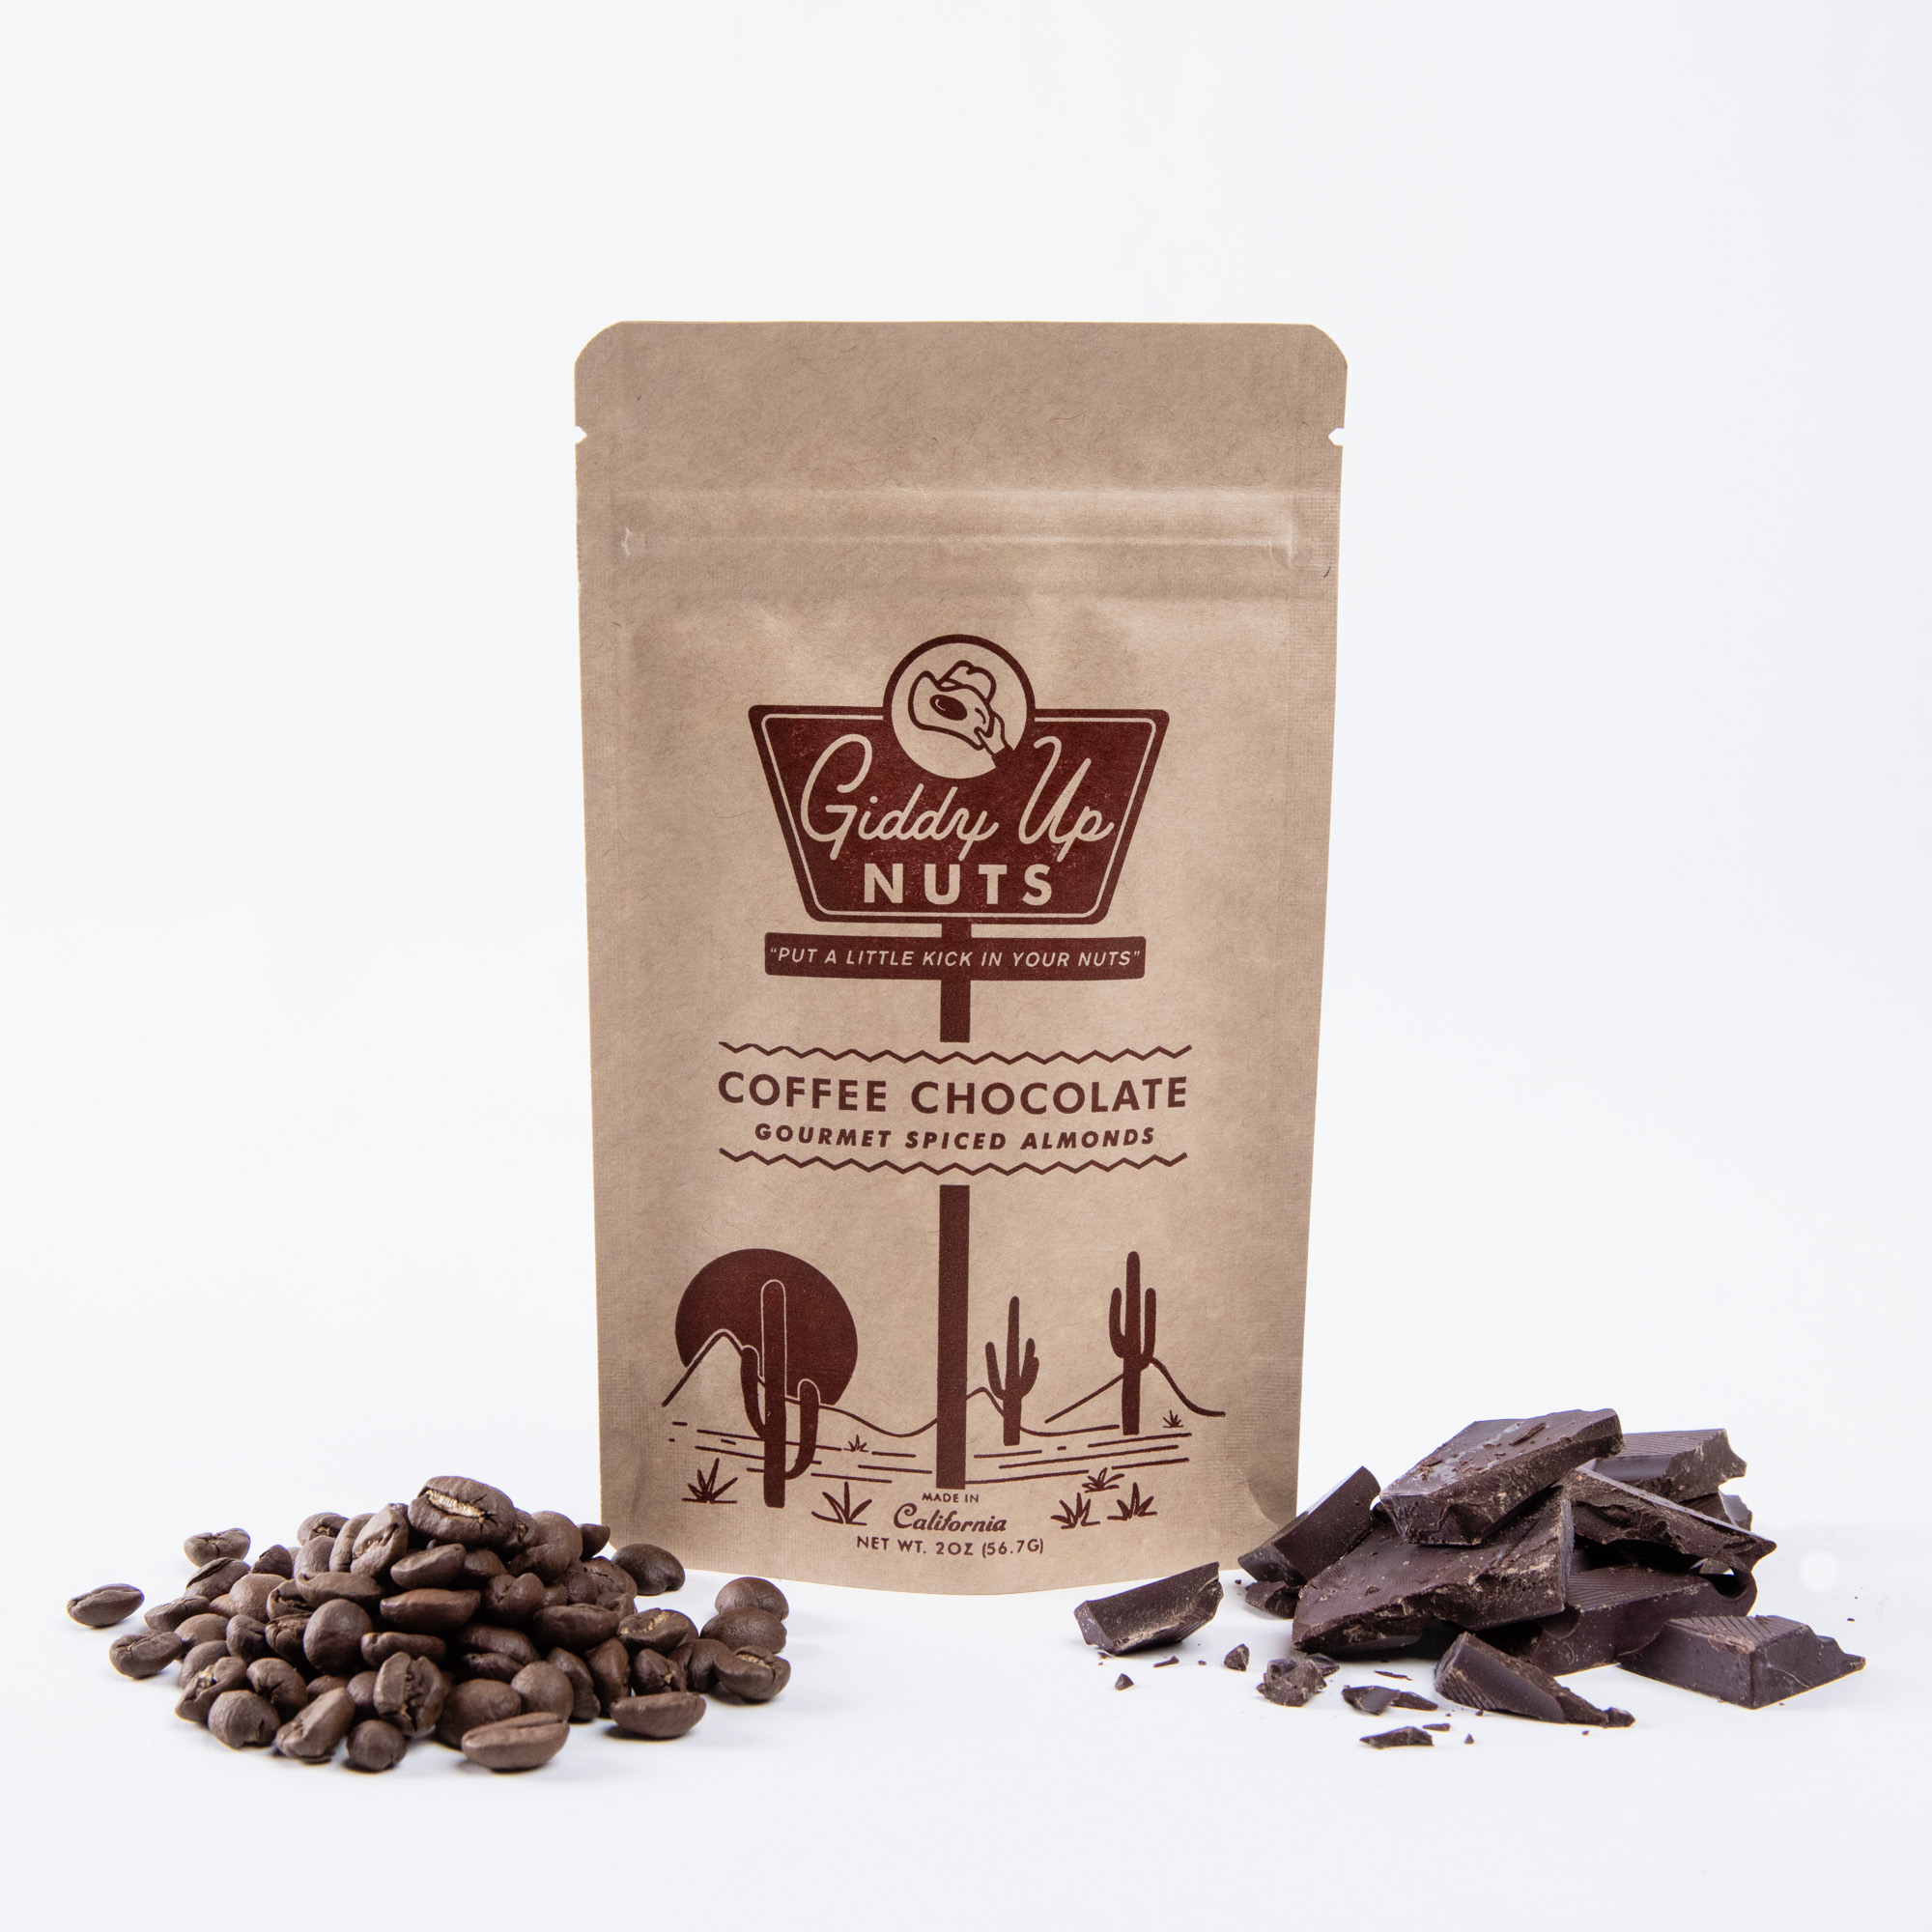 Coffee Chocolate Almonds (2 oz)